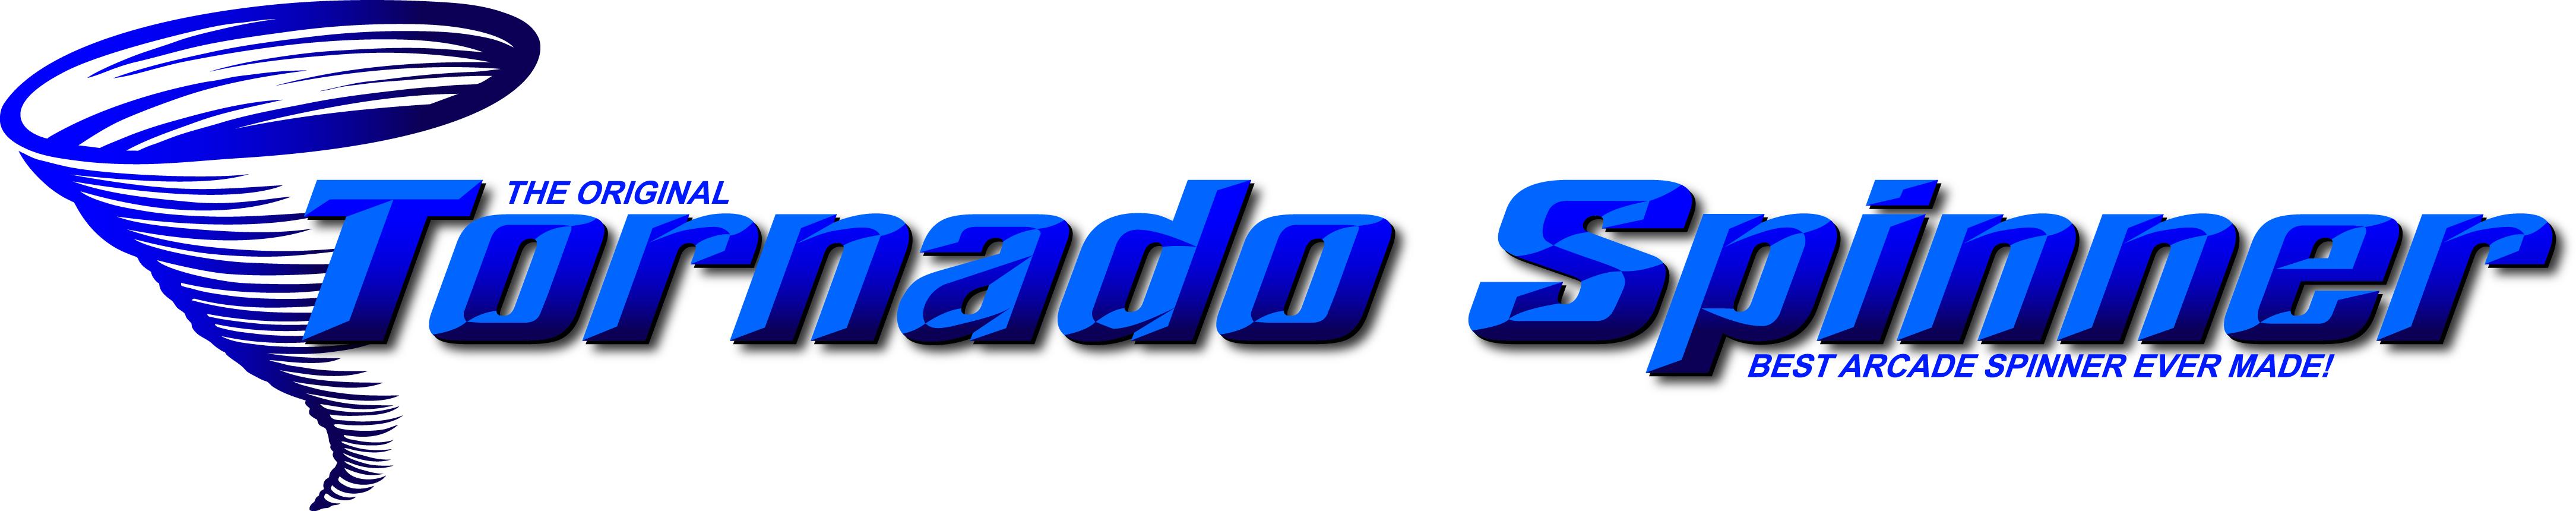 Tornado Spinner | DreamAuthentics Retro Video Arcade Cabinets